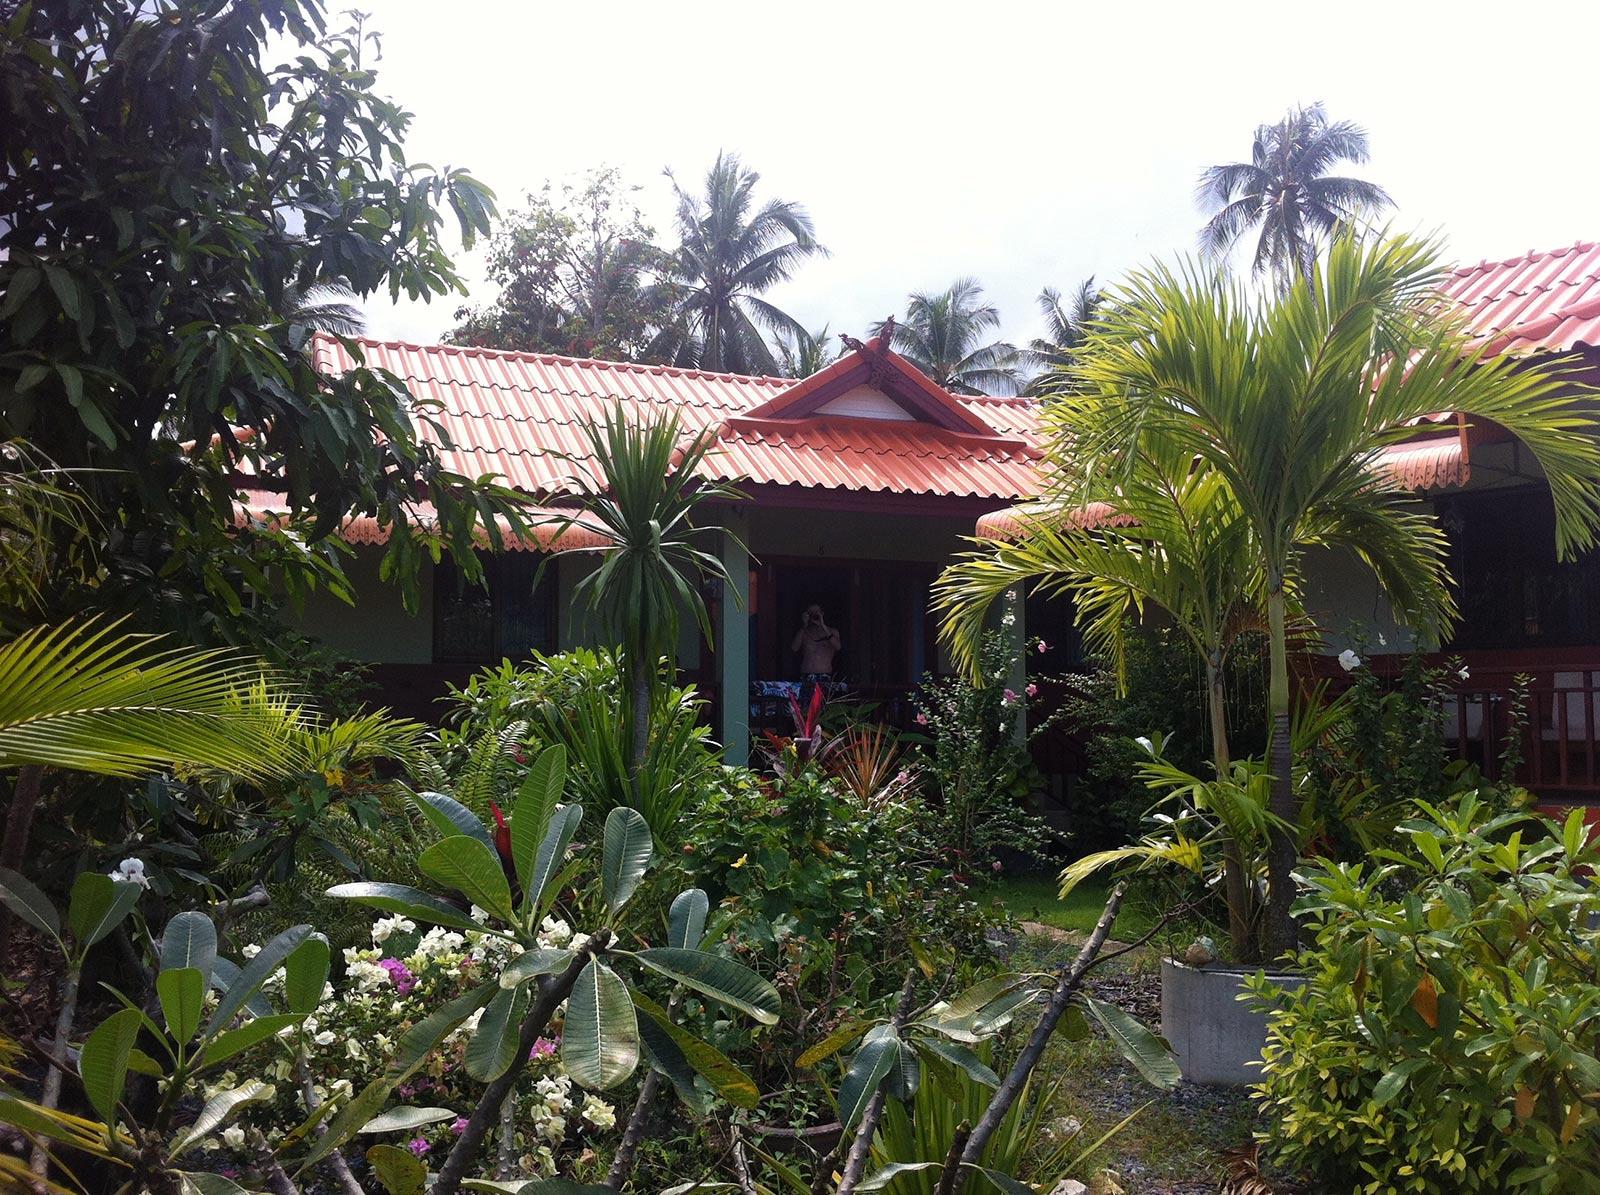 Thailand, Koh Samui Bungalow mieten; Reisetipps Koh Samui, Reisebericht Koh Samui;